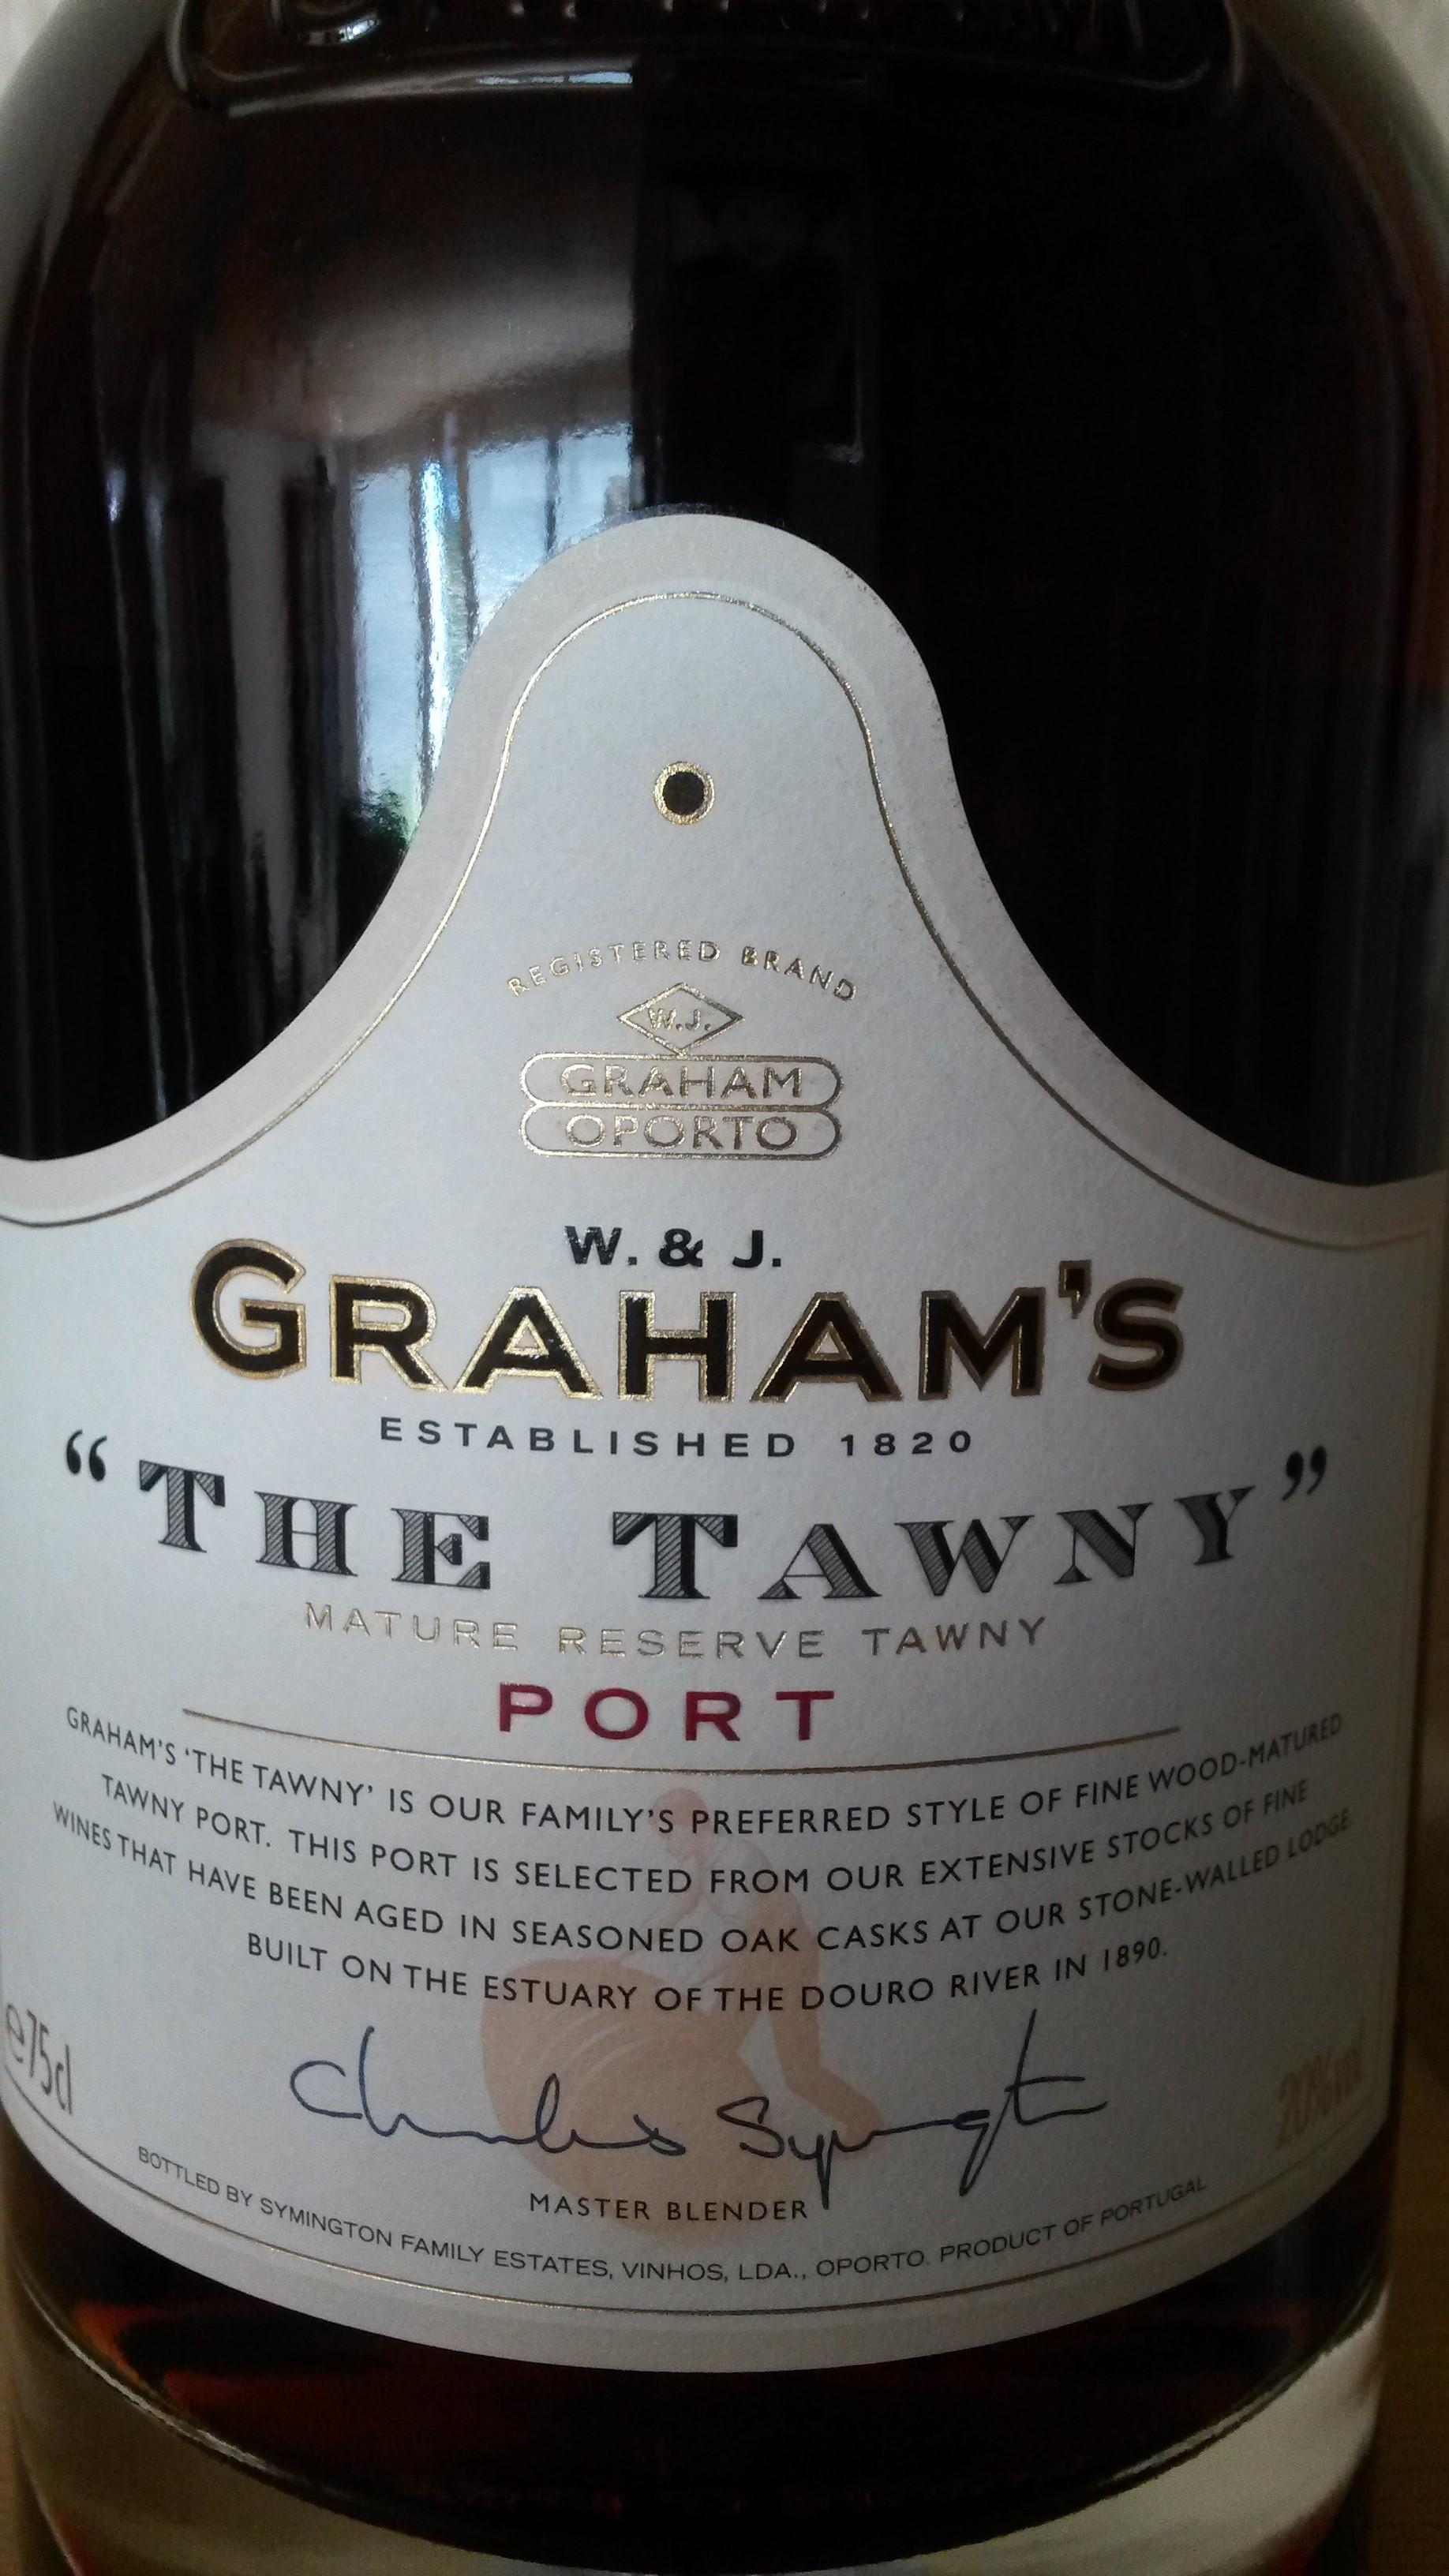 The tawny